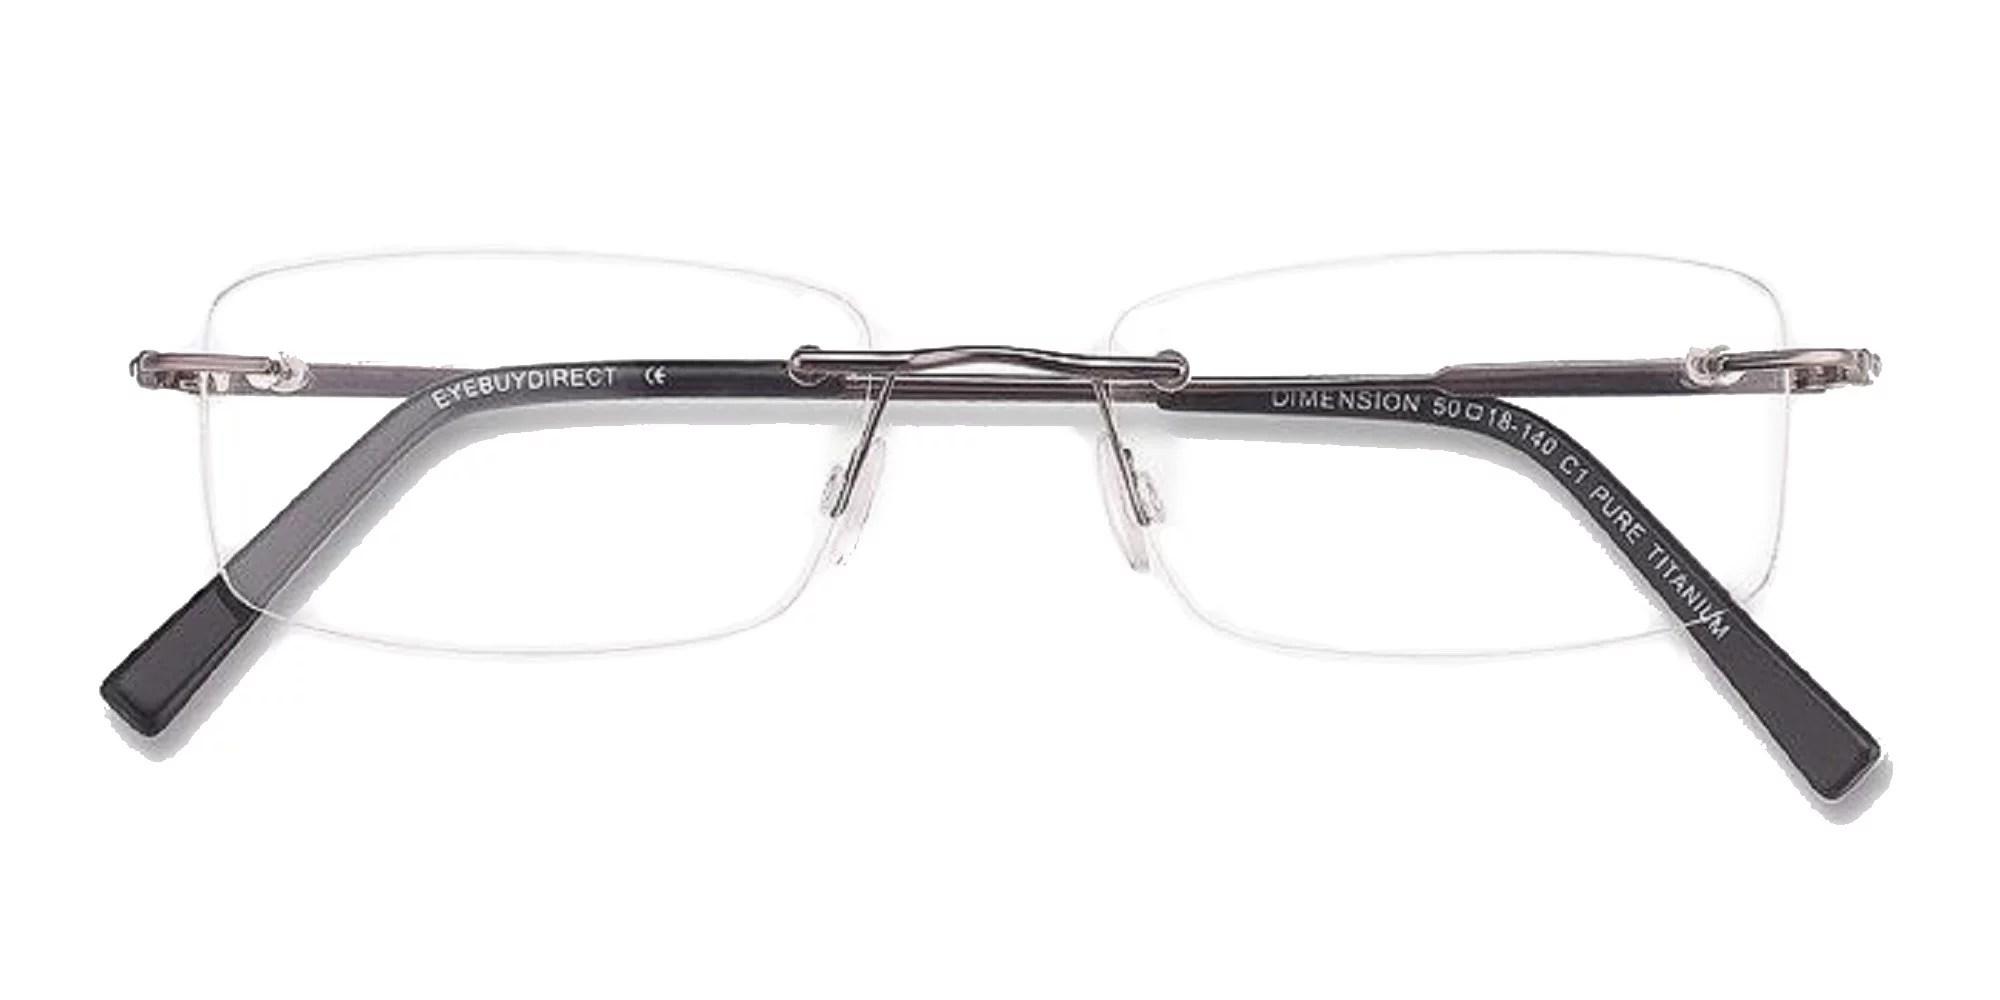 Naturally Rimless Men's Eyeglasses Frame Rimless Metal ...